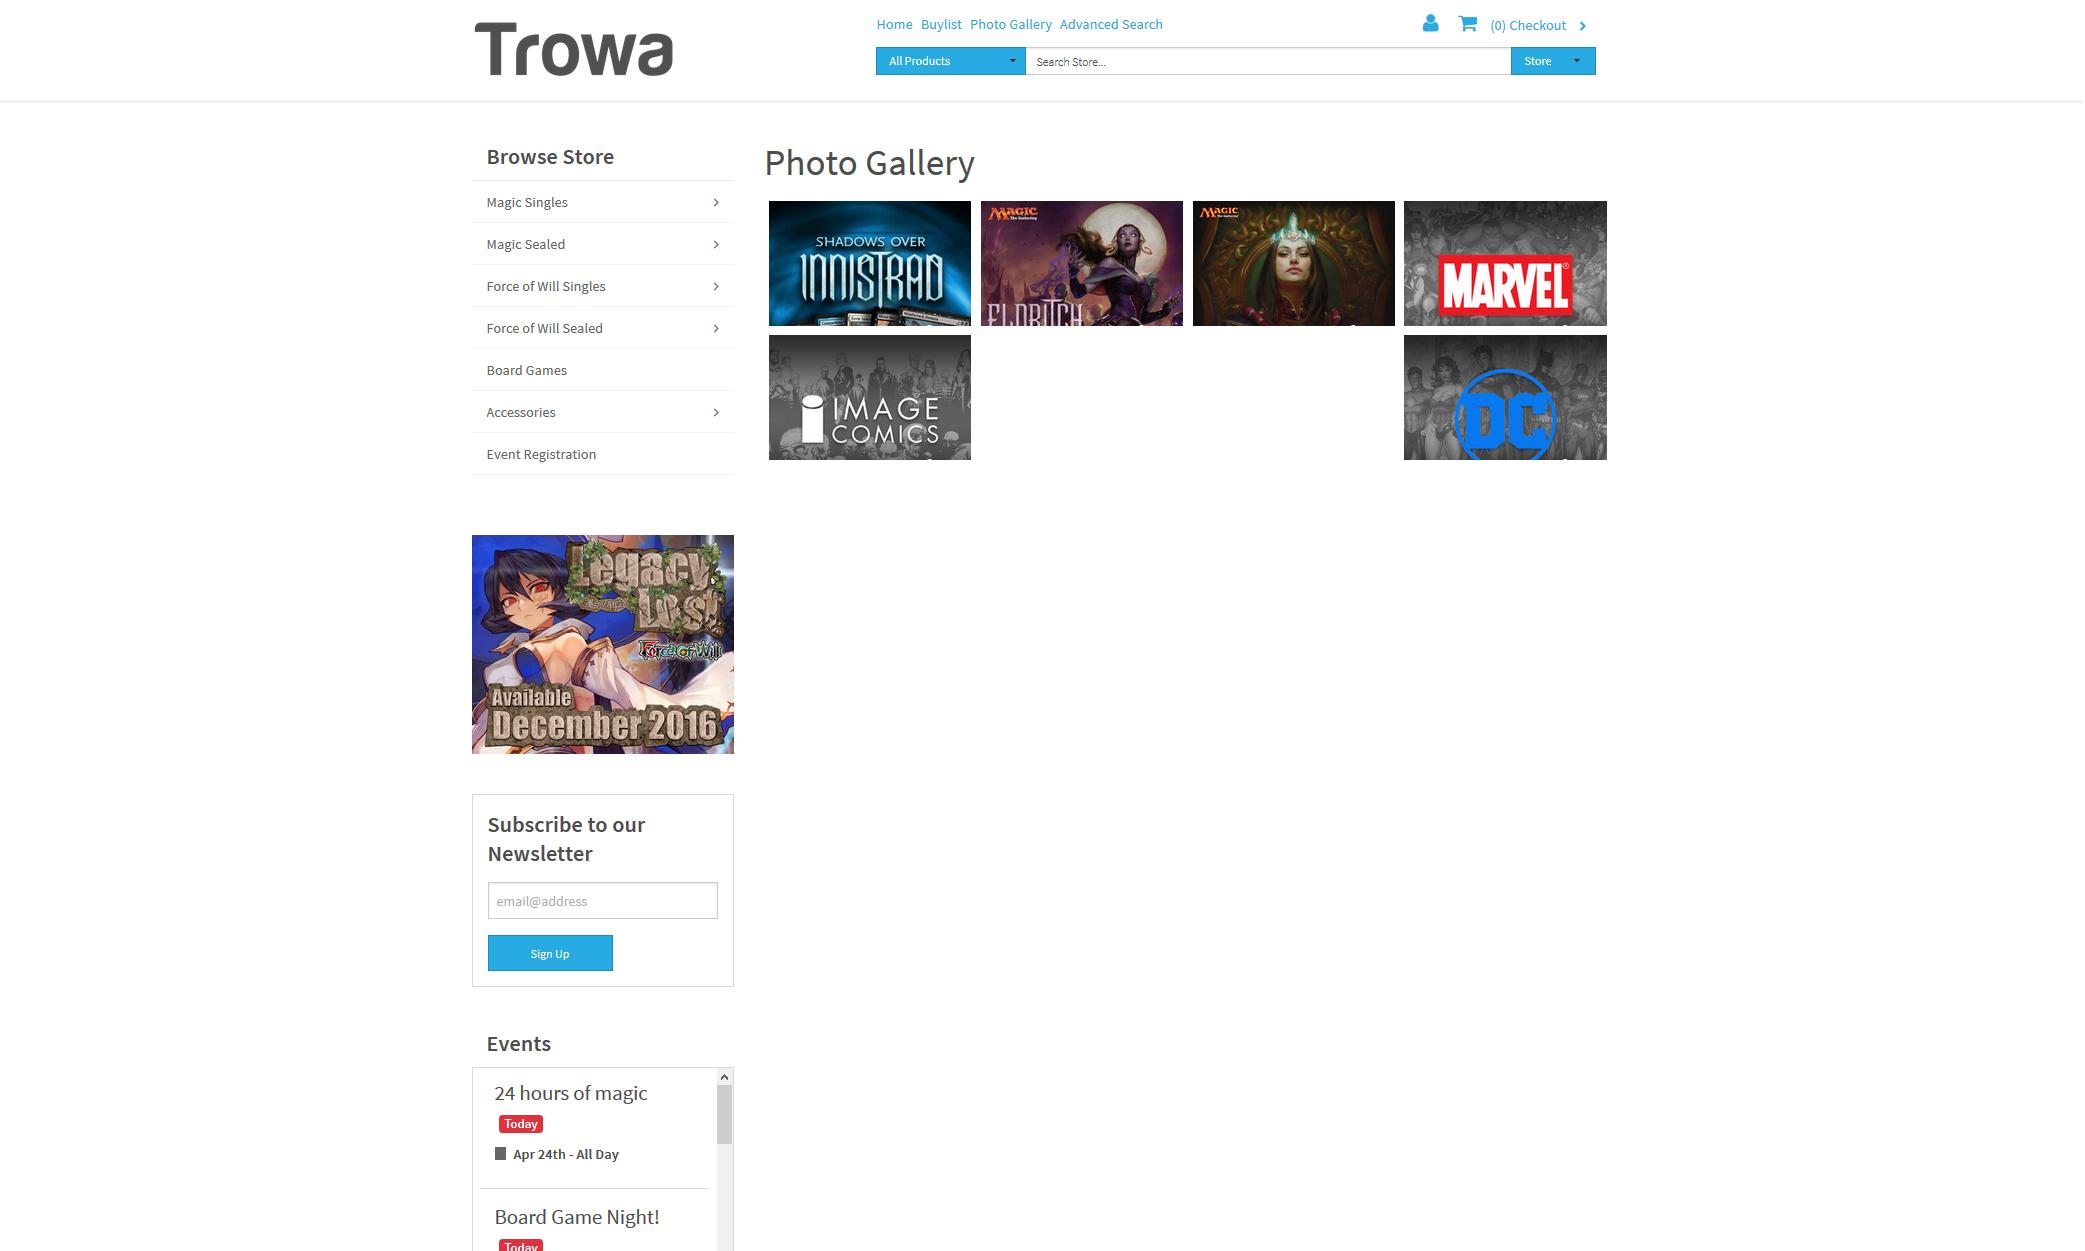 Trowa - Premium Theme